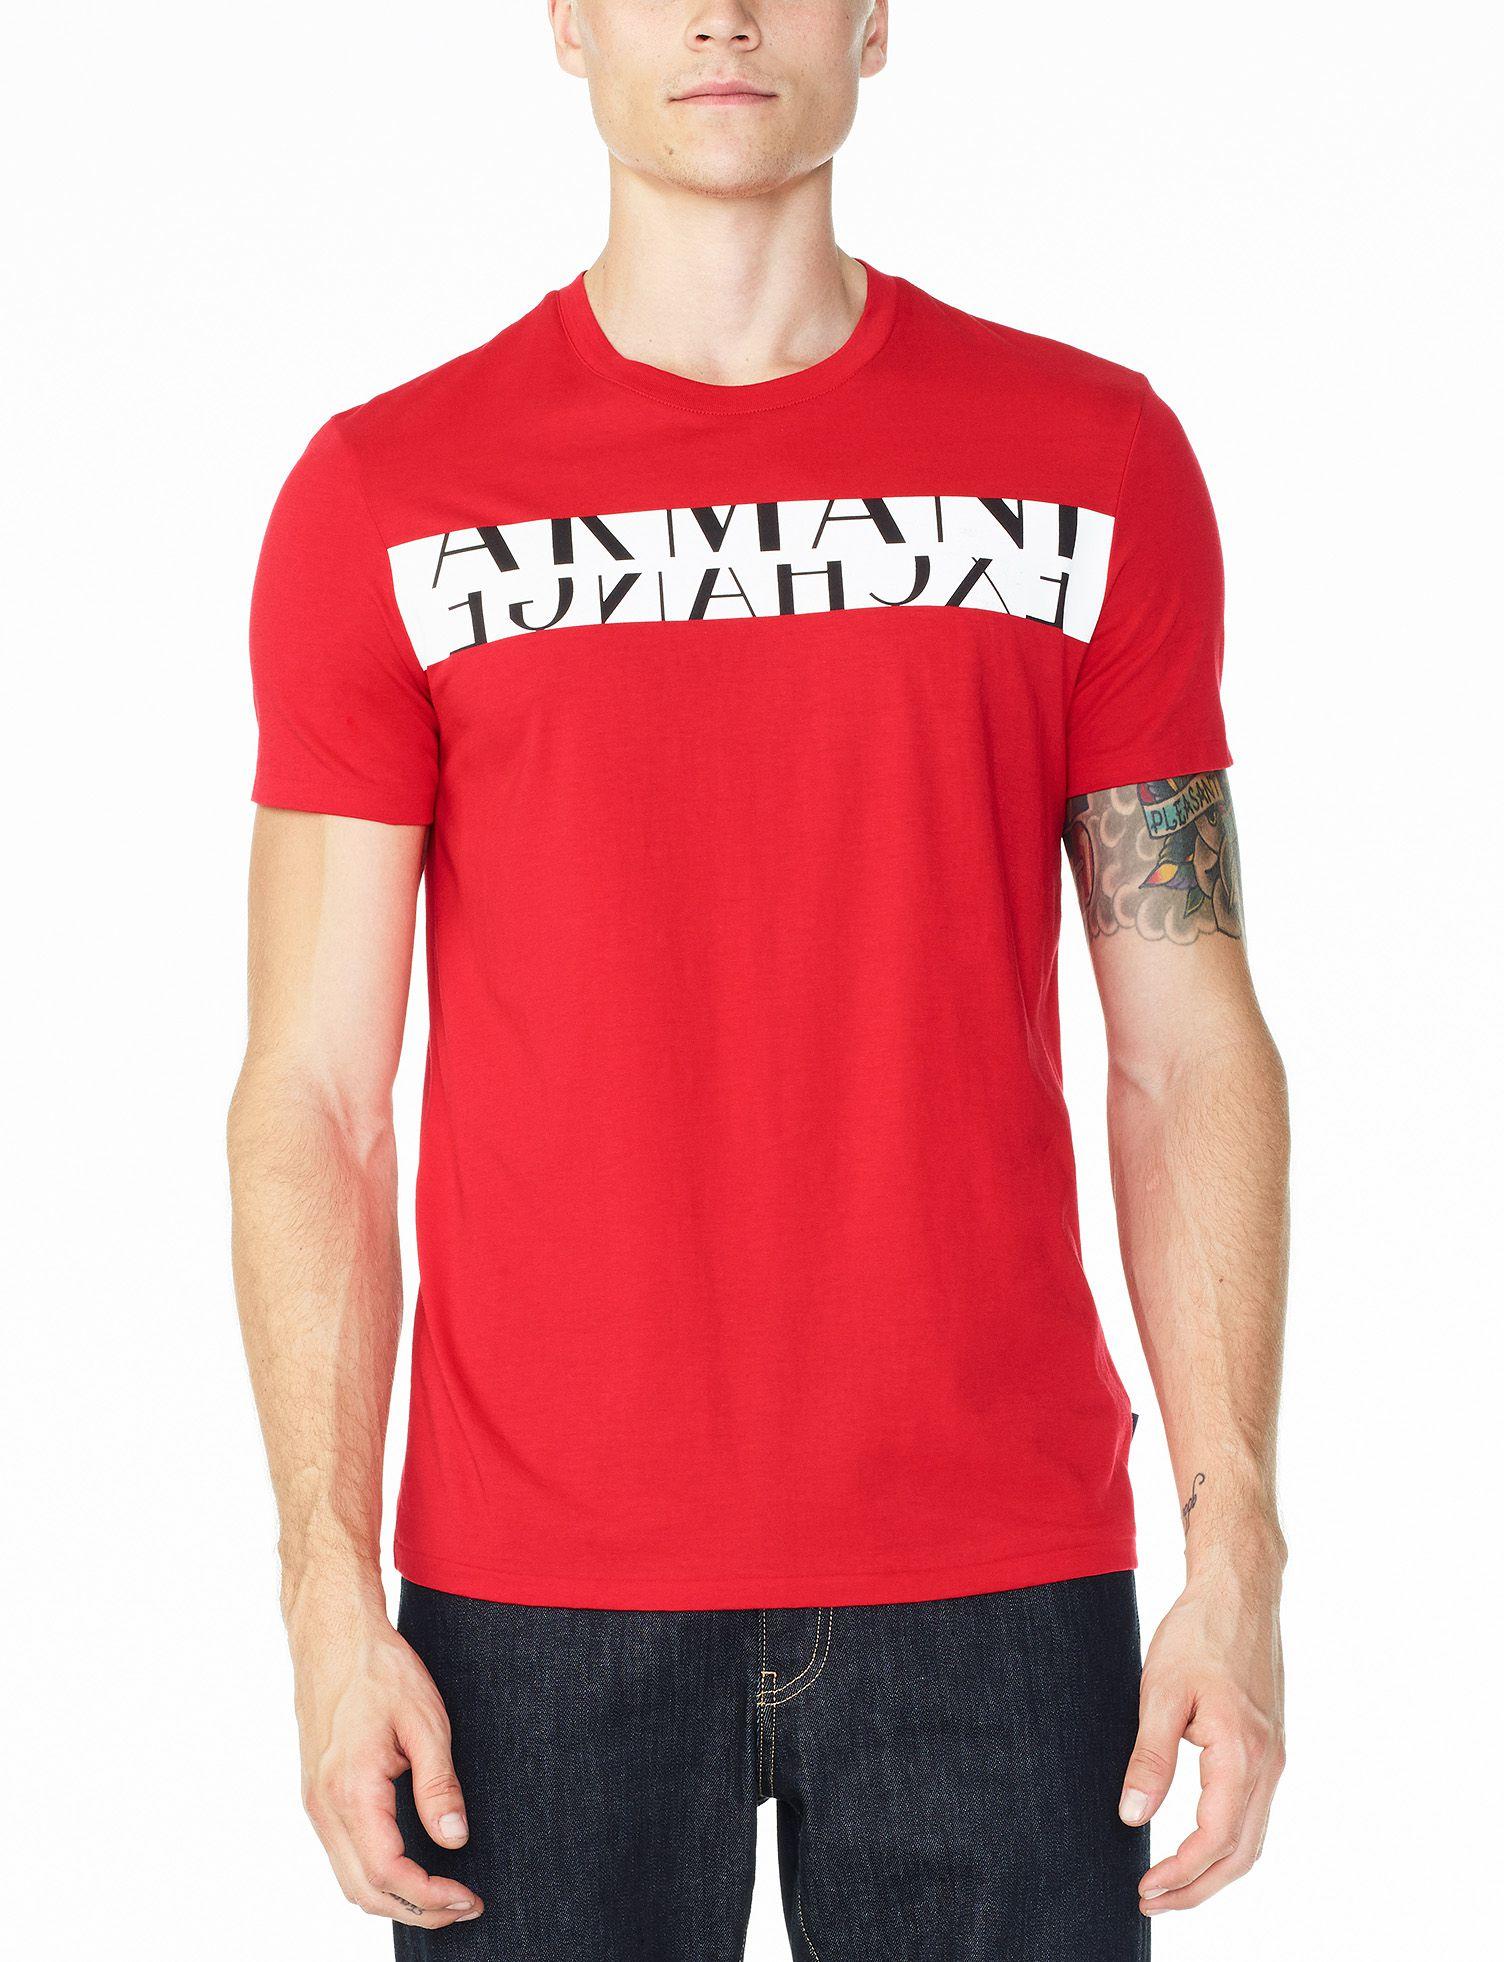 5cca259ce4c Camiseta Armani Exchange Vermelha - EuEnvio Importados  Relógios ...